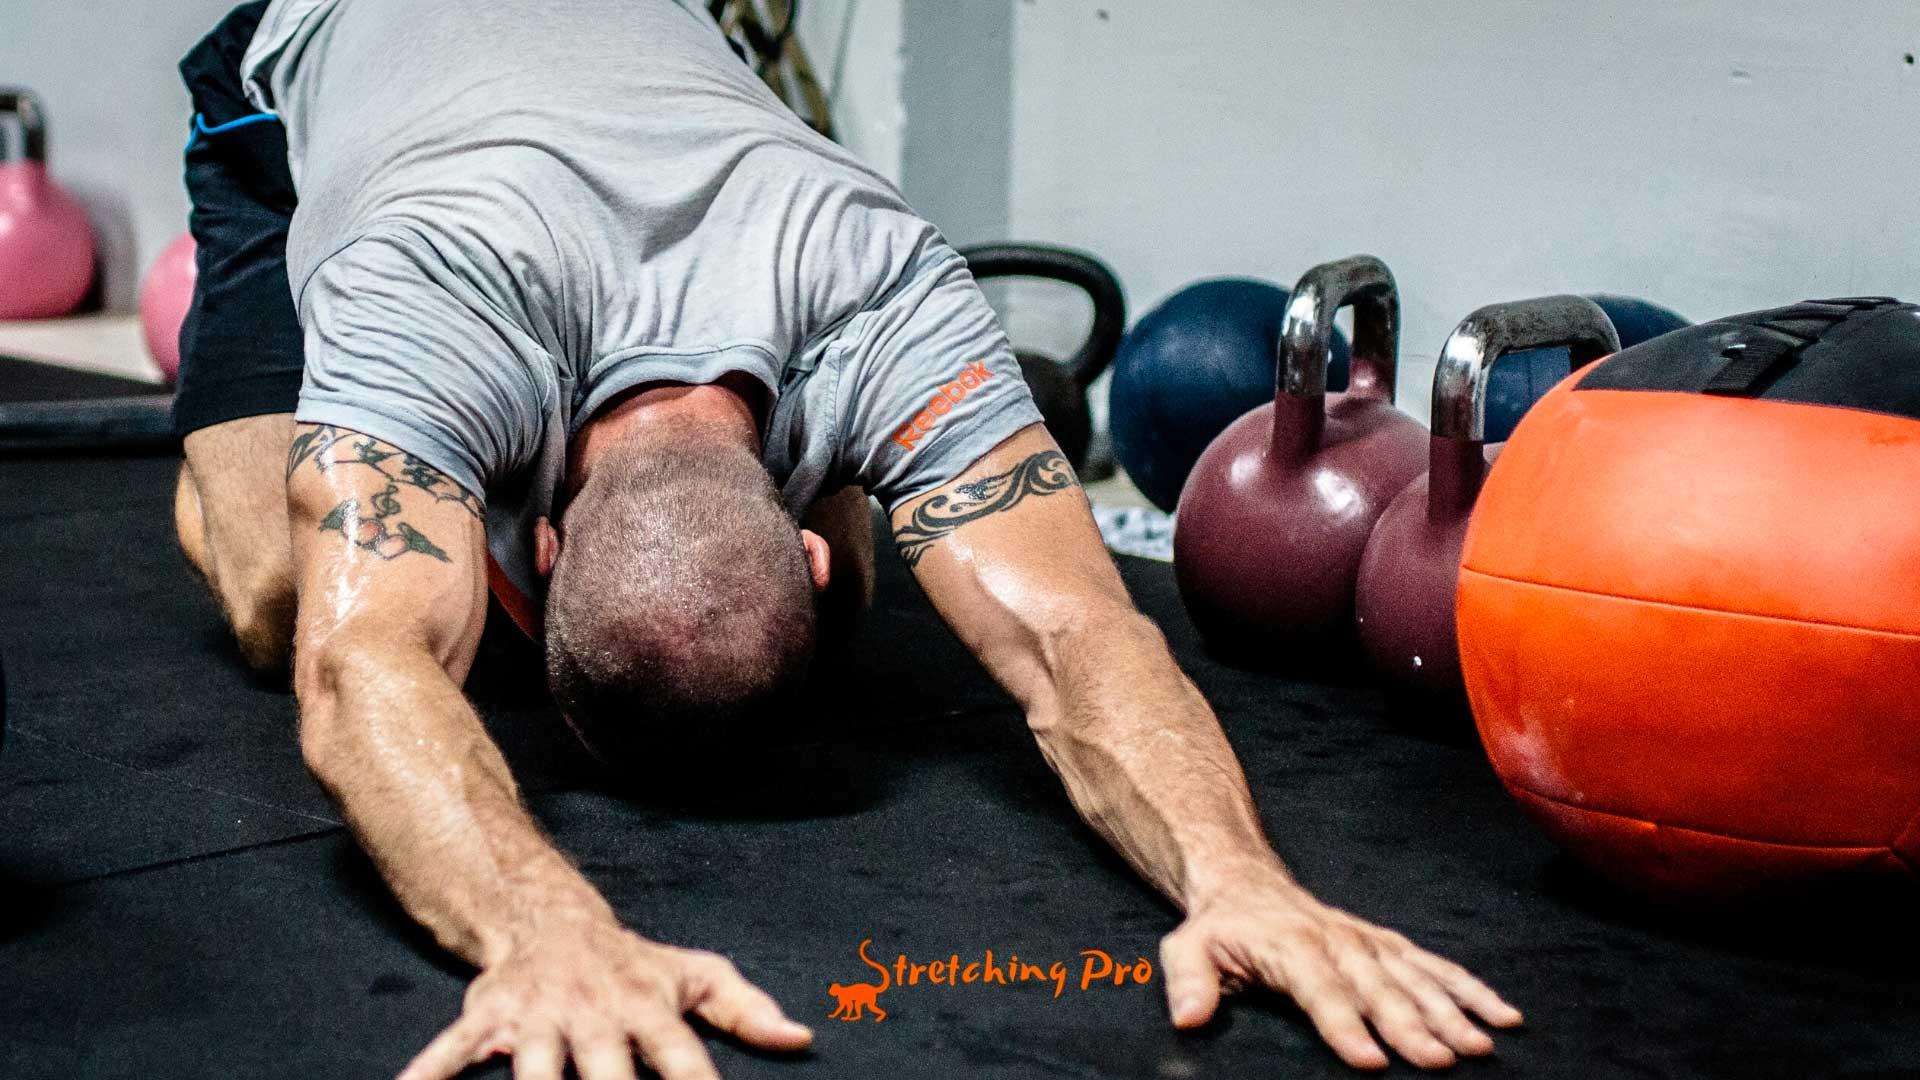 stretchingpro-etirement-musculation-haut-corps